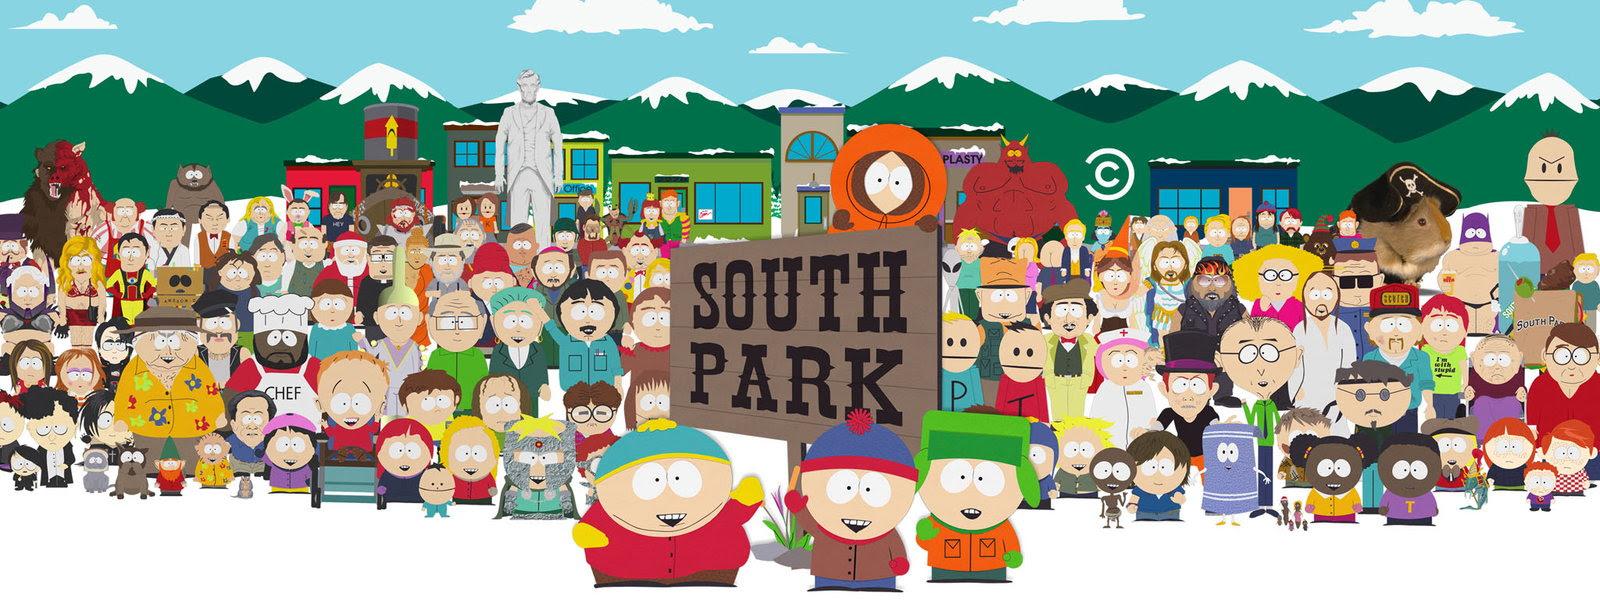 Resultado de imagen de south park